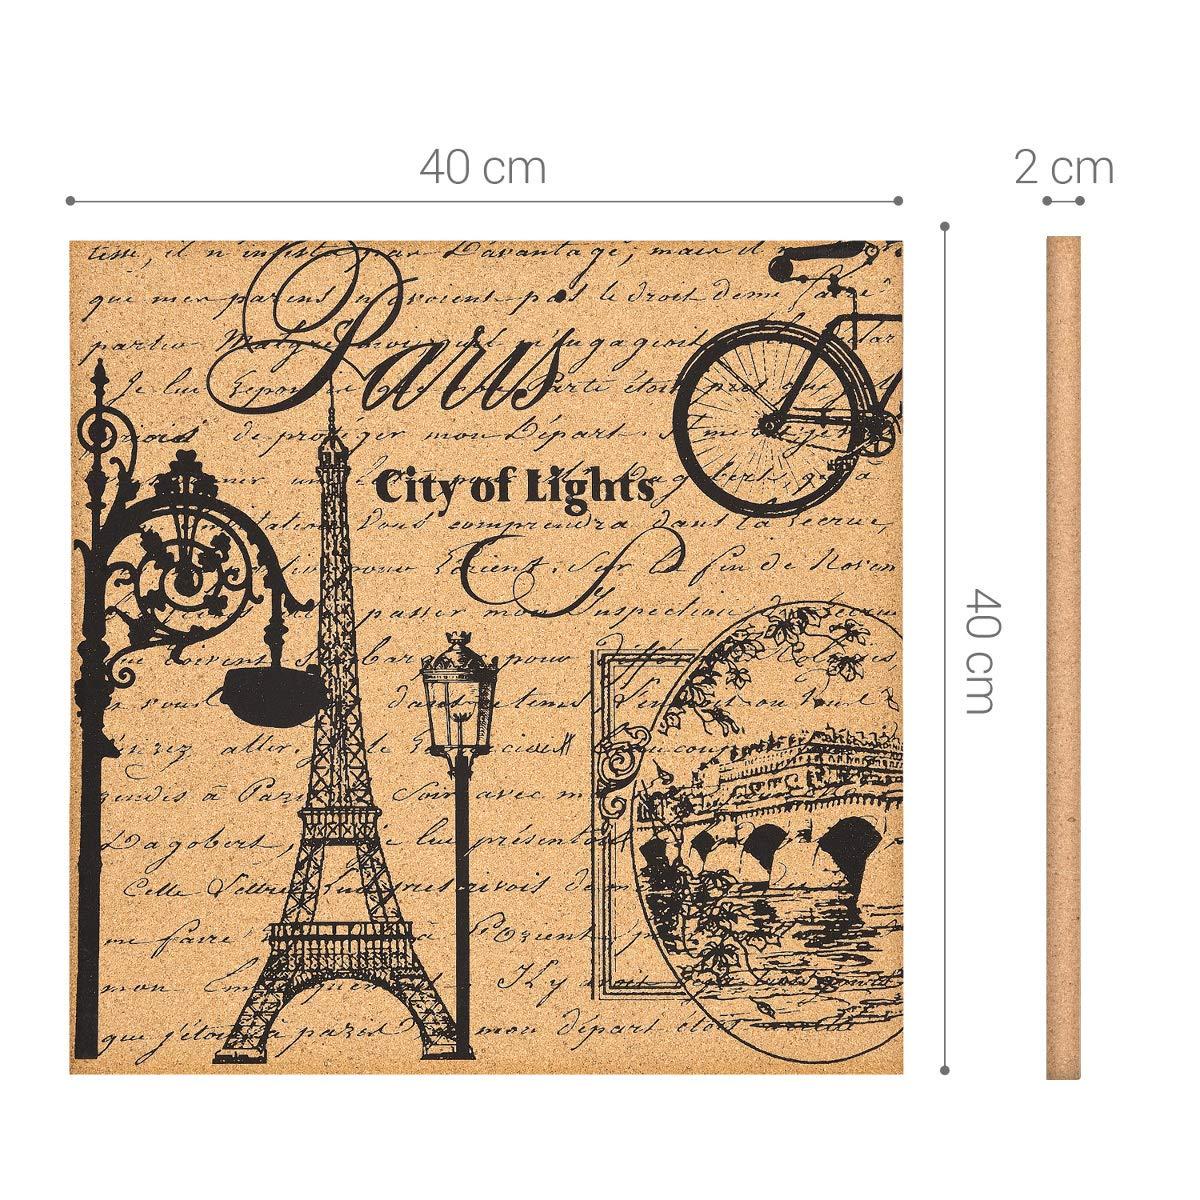 Navaris Cork Bulletin Board - 40 x 40 cm Push Pin Memo Corkboard in Eiffel Tower Design with Push Pins for Kitchen, Classroom, Home Office, Bedroom